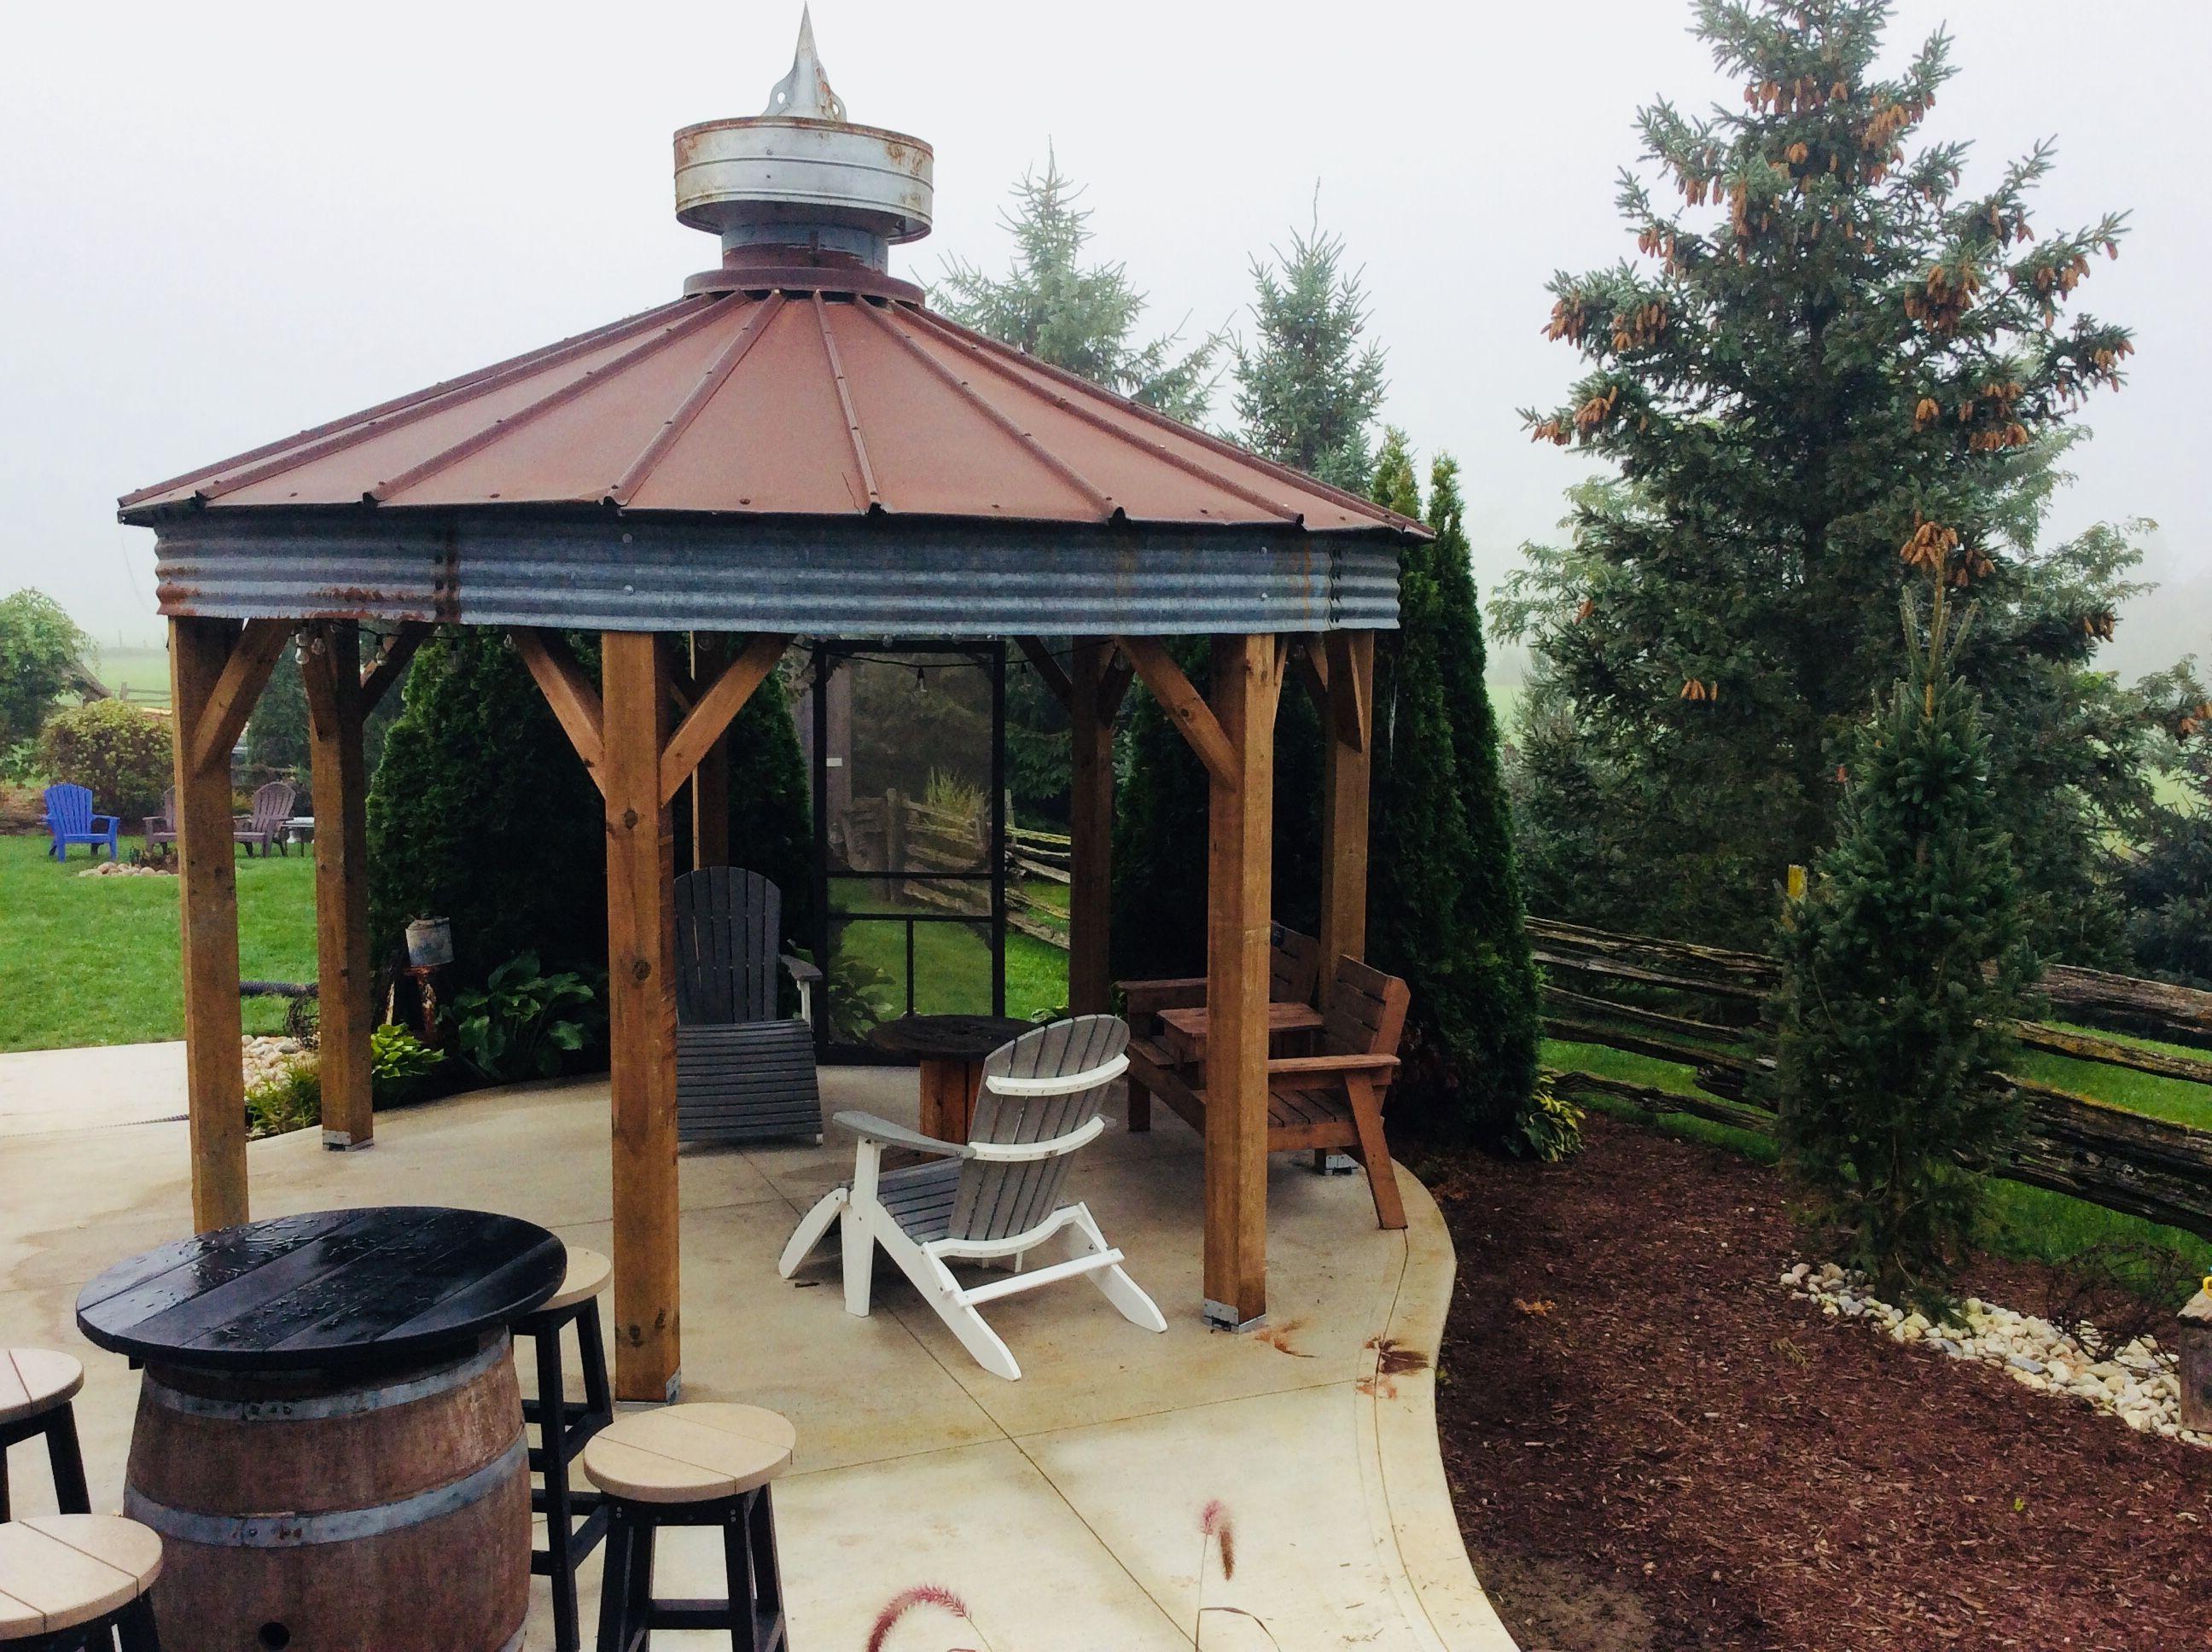 Paradise Outdoor Kitchens For Entertaining Guests Outdoor Pergola Backyard Gazebo Pergola